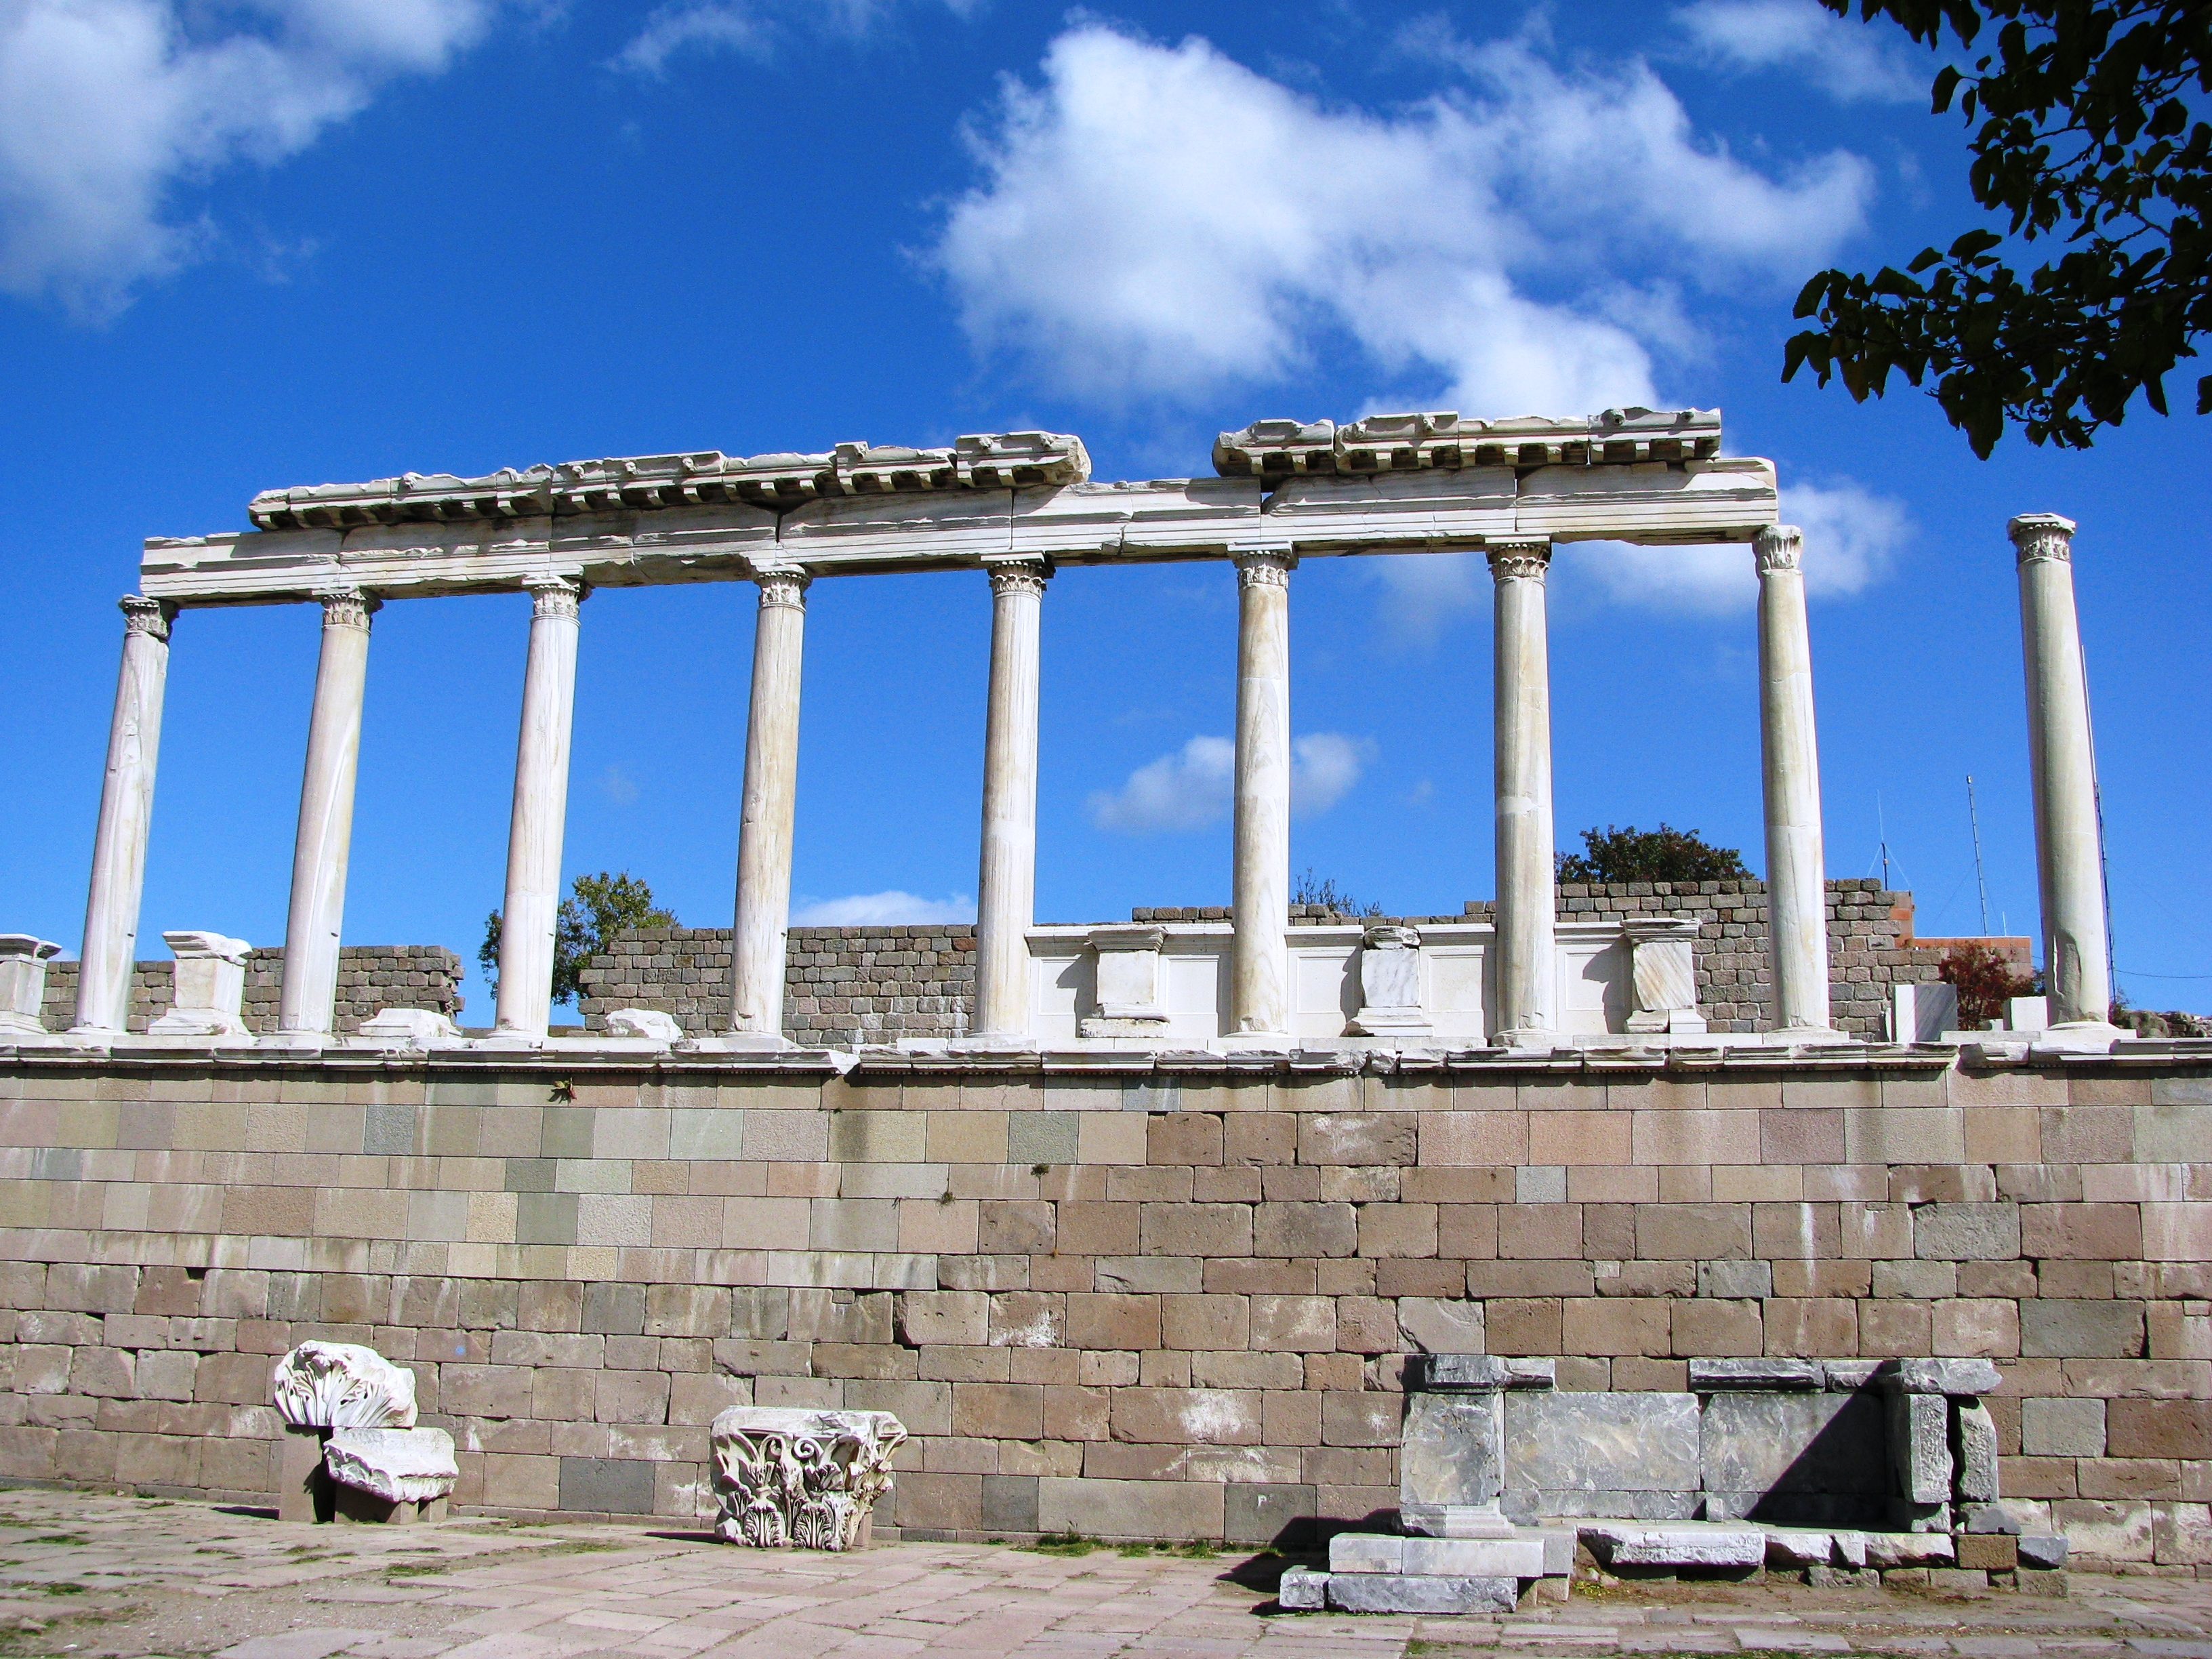 Pergamon Columns, Ancient, Bergama, Columns, Emperor, HQ Photo